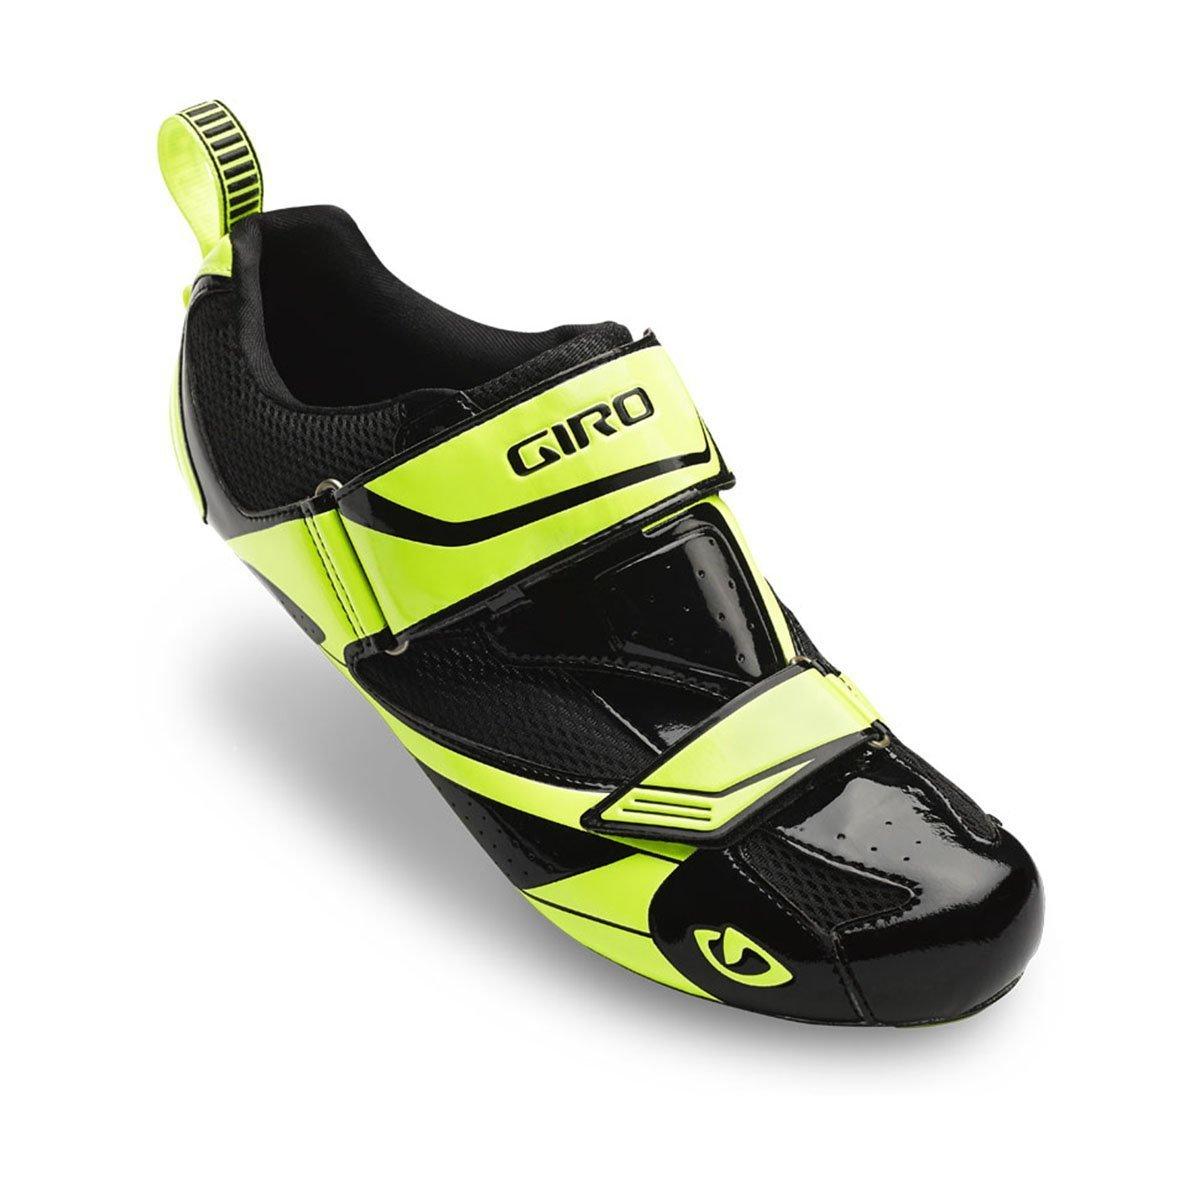 Giro メンズ Giro B00NDJWRNI 39.5 EU|Black / Highlight Yellow Black / Highlight Yellow 39.5 EU